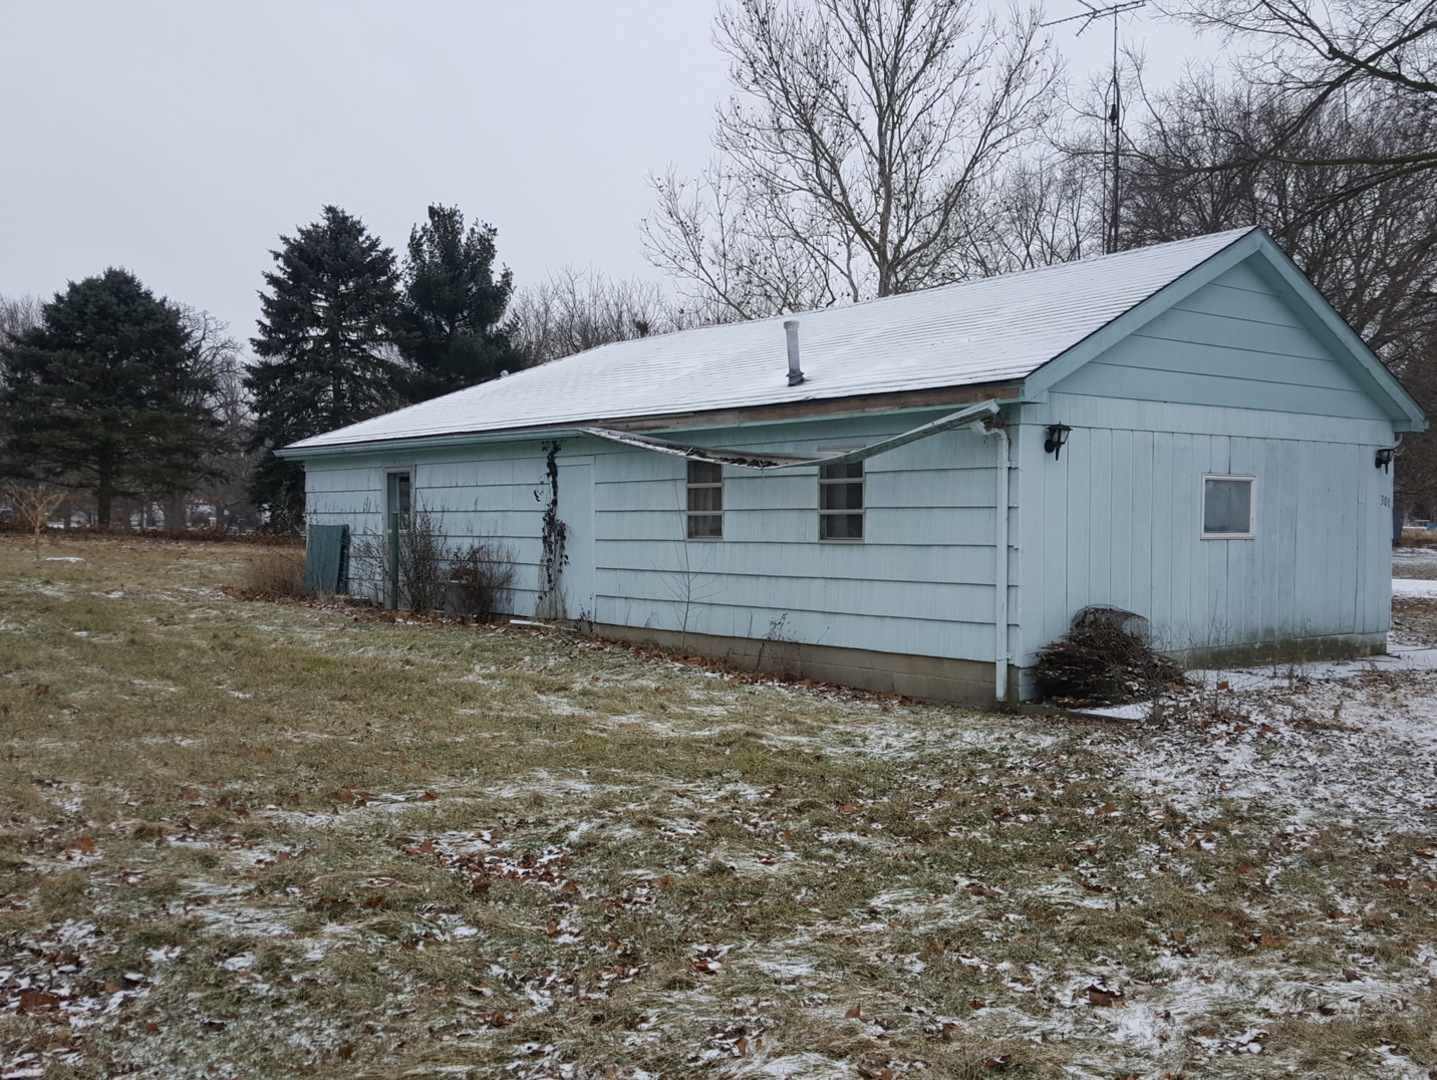 301 East 3rd, Melvin, Illinois, 60952